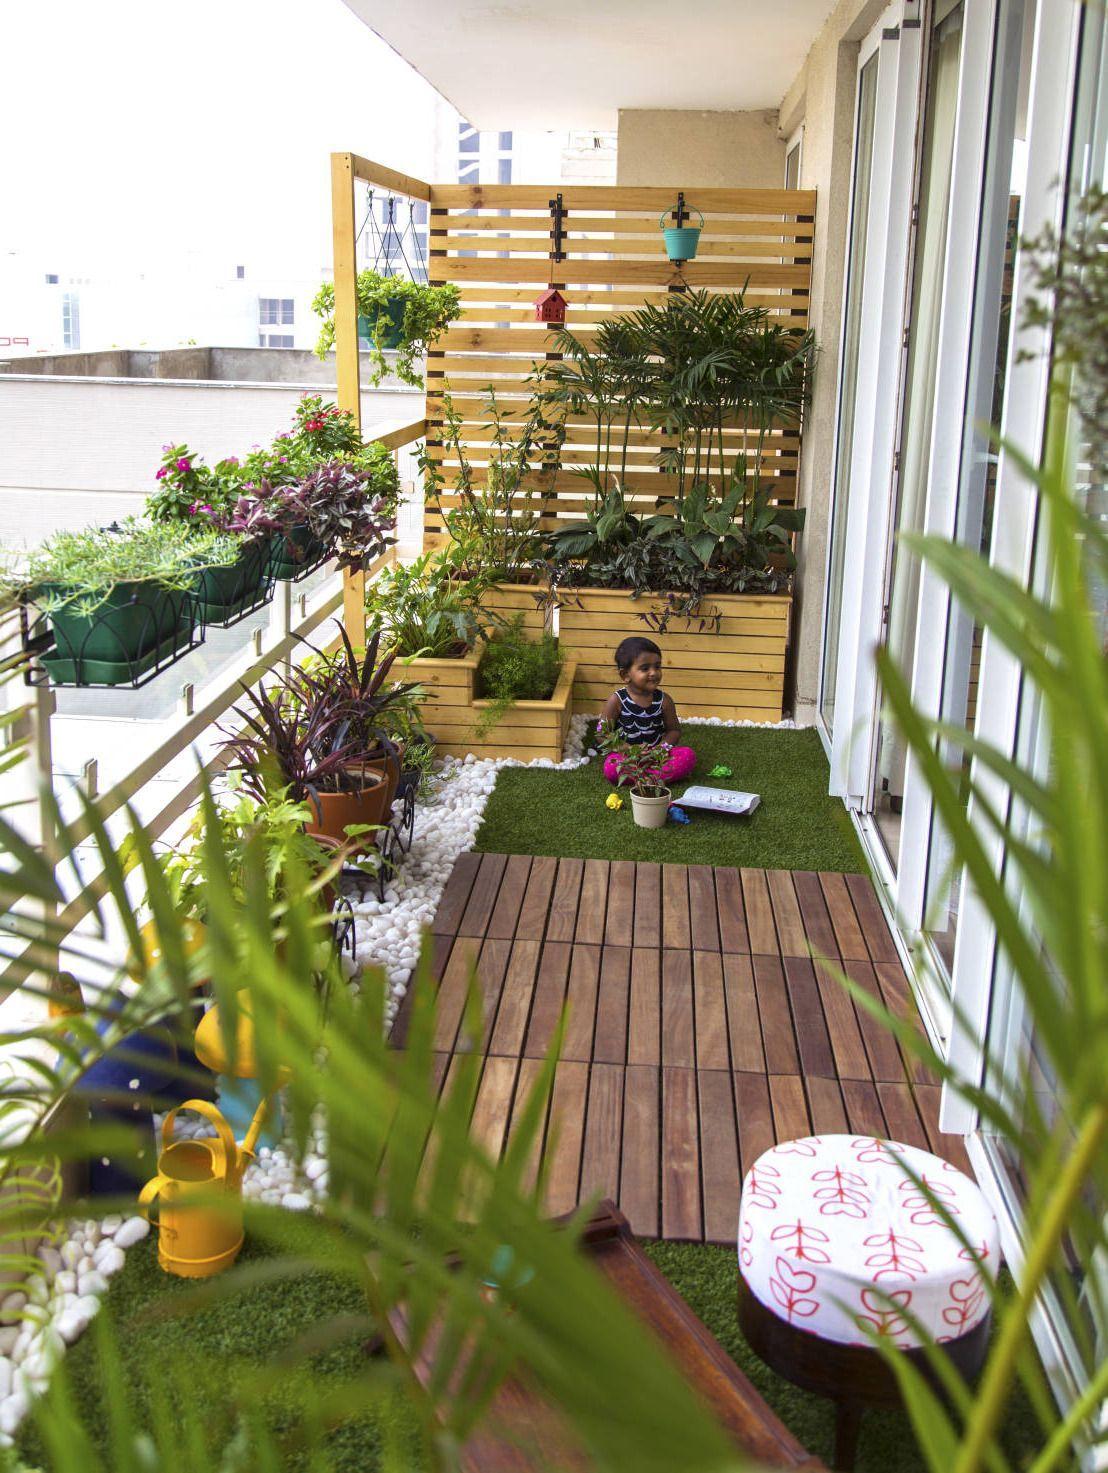 9cf9d3536a41518c607b187423a33f47 - What Is The Purpose Of Terrace Gardening